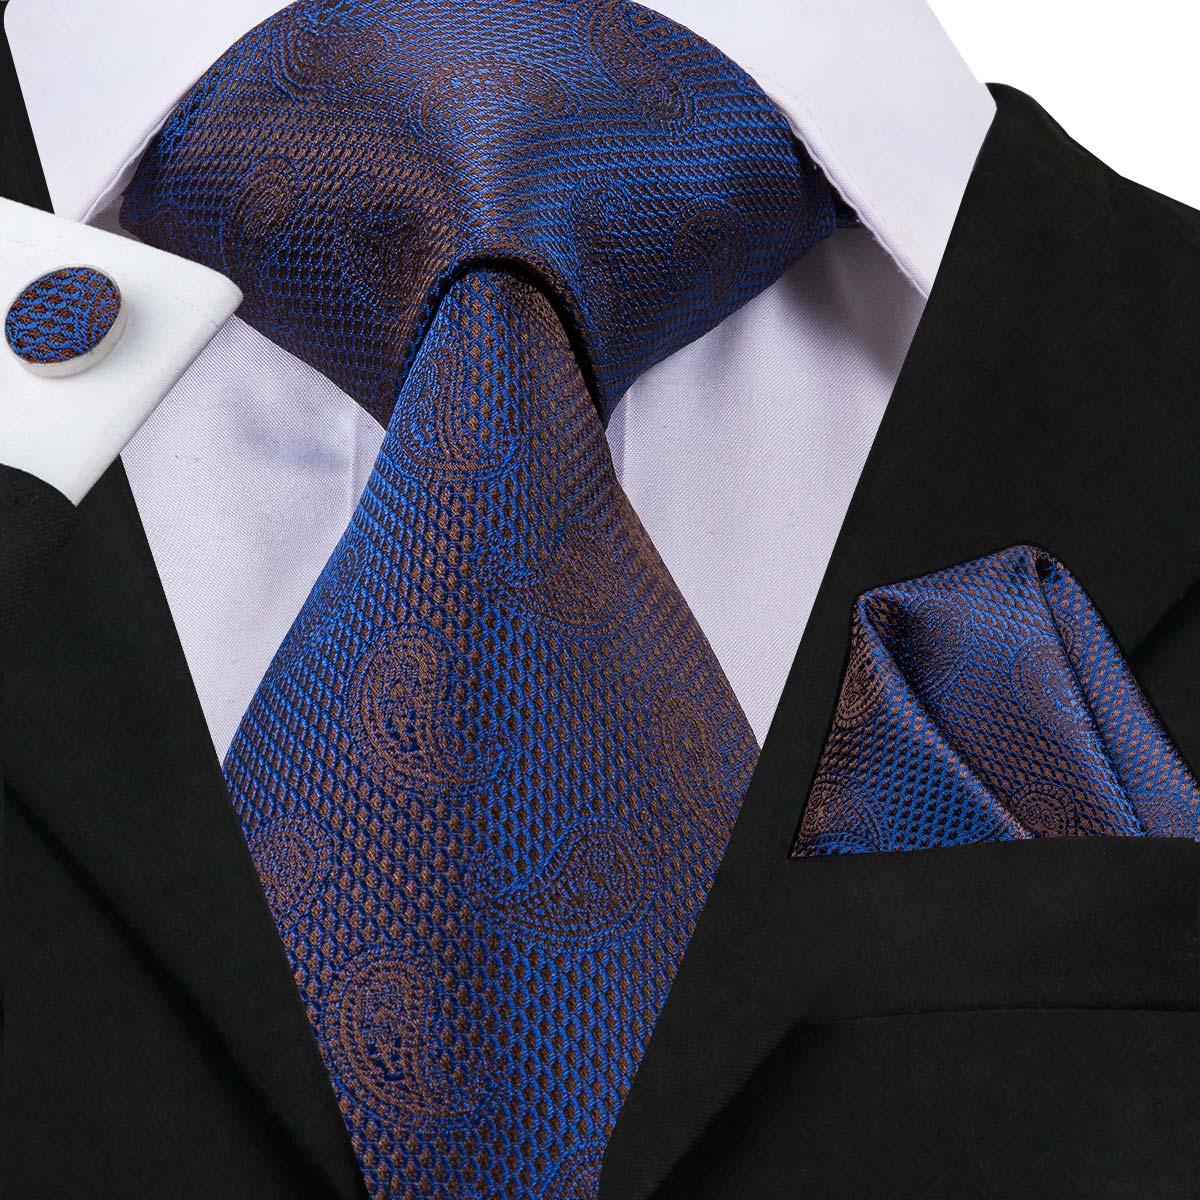 Hi-Tie Designer Brand 2018 New Arrival Necktie For Men Business Style Jacquard Woven Gravata Ties Hanky Cufflinks Set C-3048